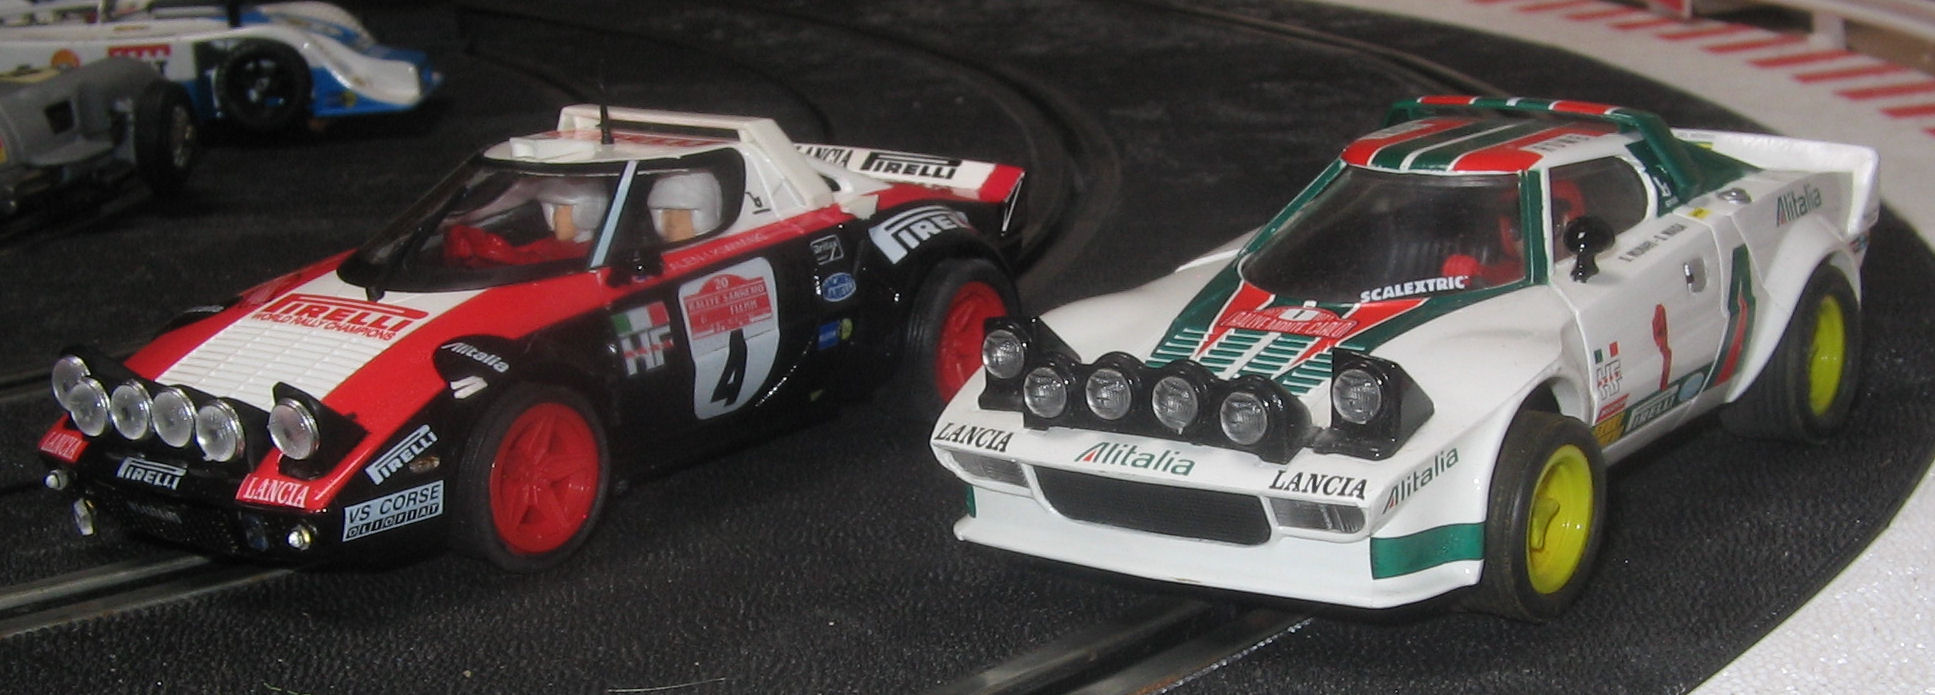 lancia stratos: teamslot 11502 rally san remo 1978 & scx altaya